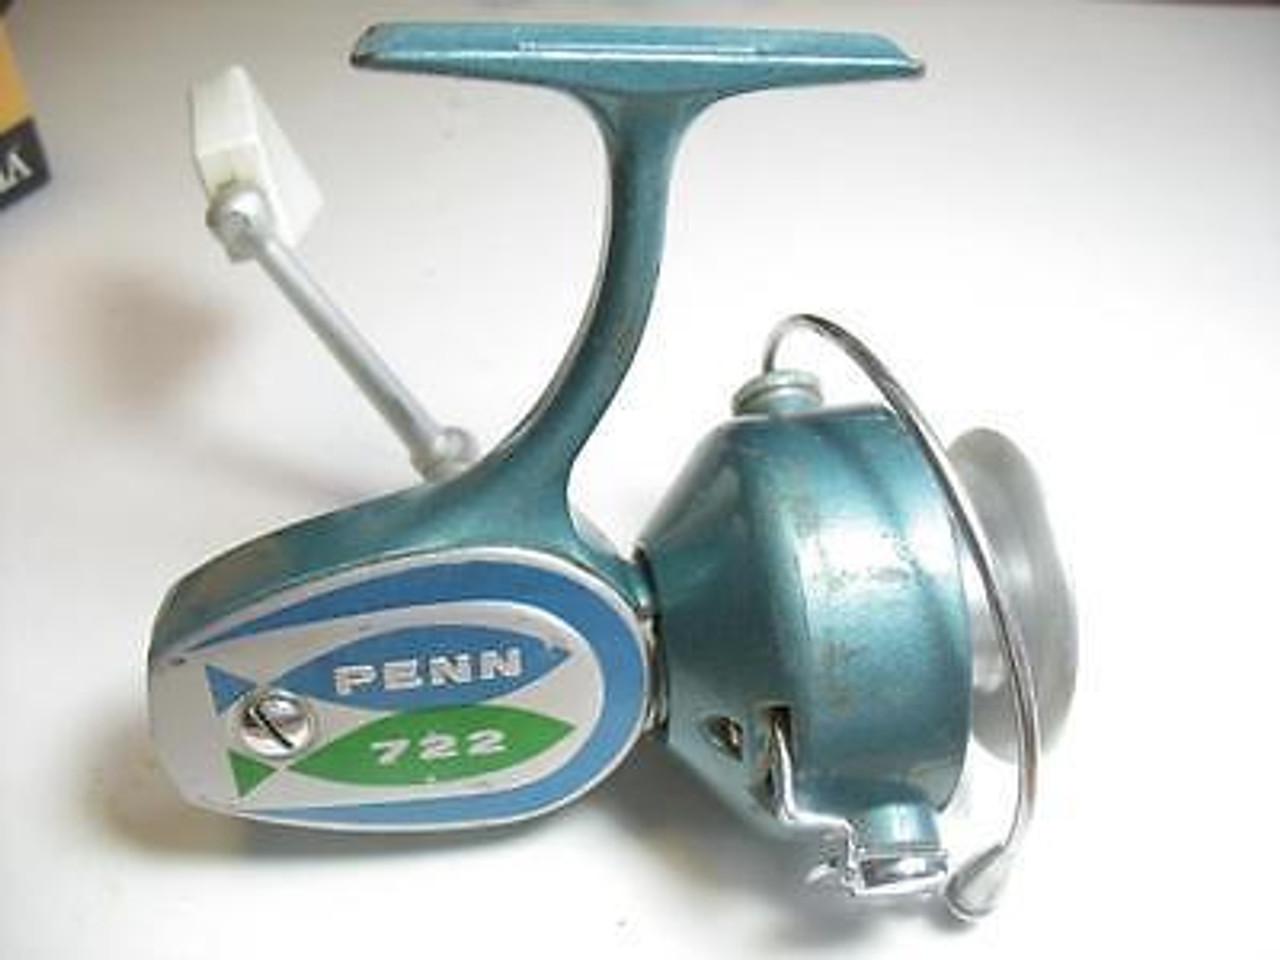 5500ss Bearing Penn 20-722 Spinfisher Reel Part for sale online